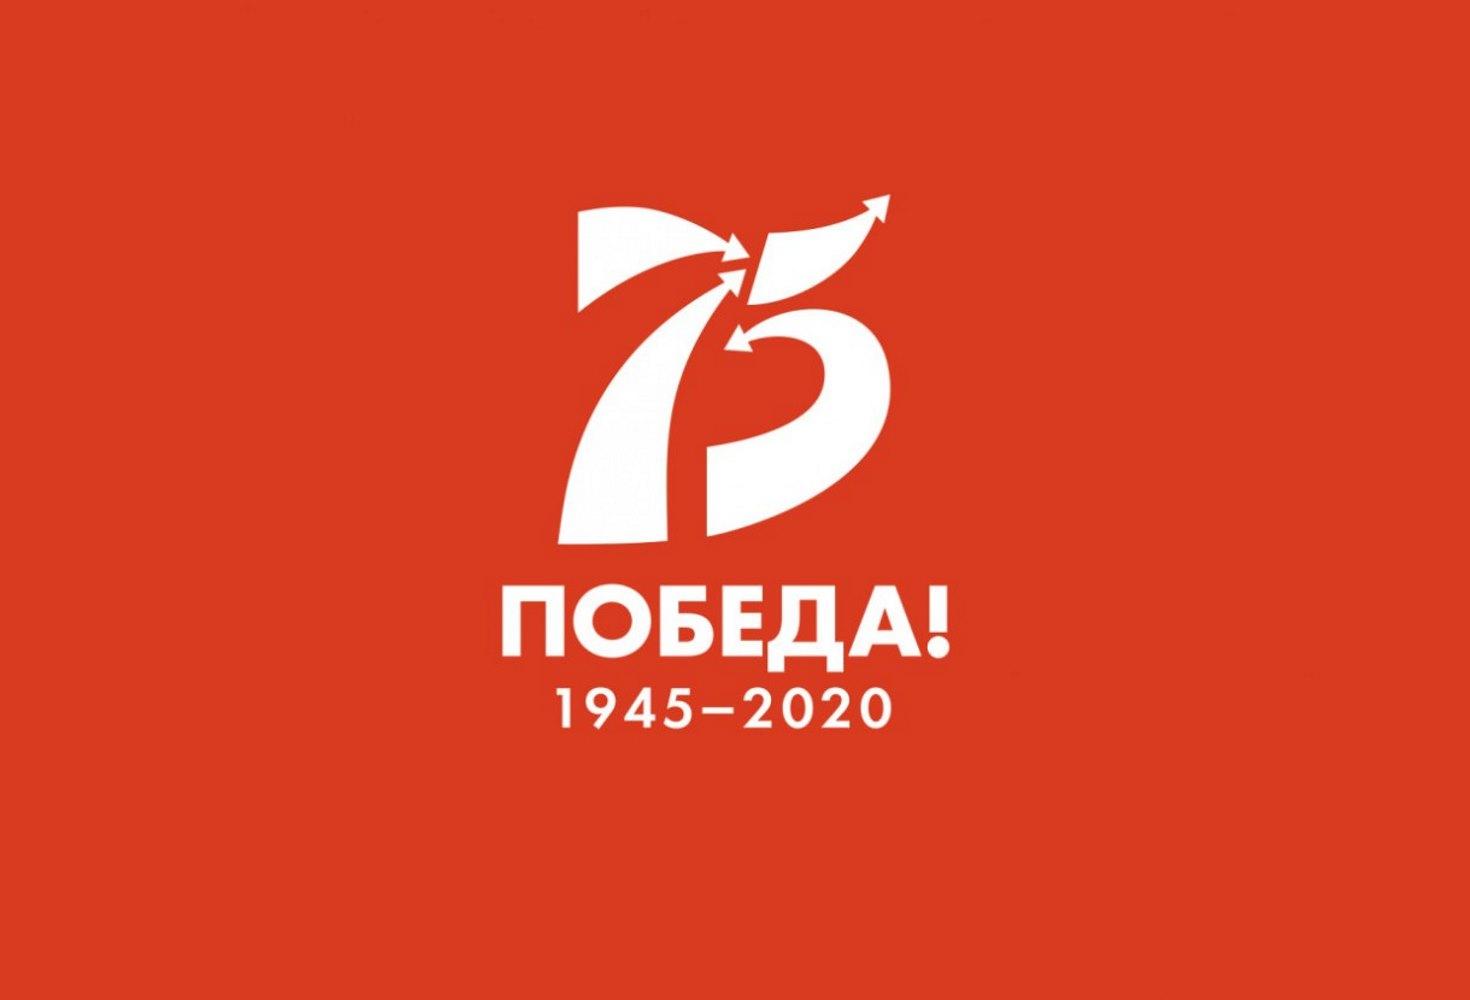 v-rossii-projdet-konkurs-shkolnyh-smi-75-let-velikoj-pobede